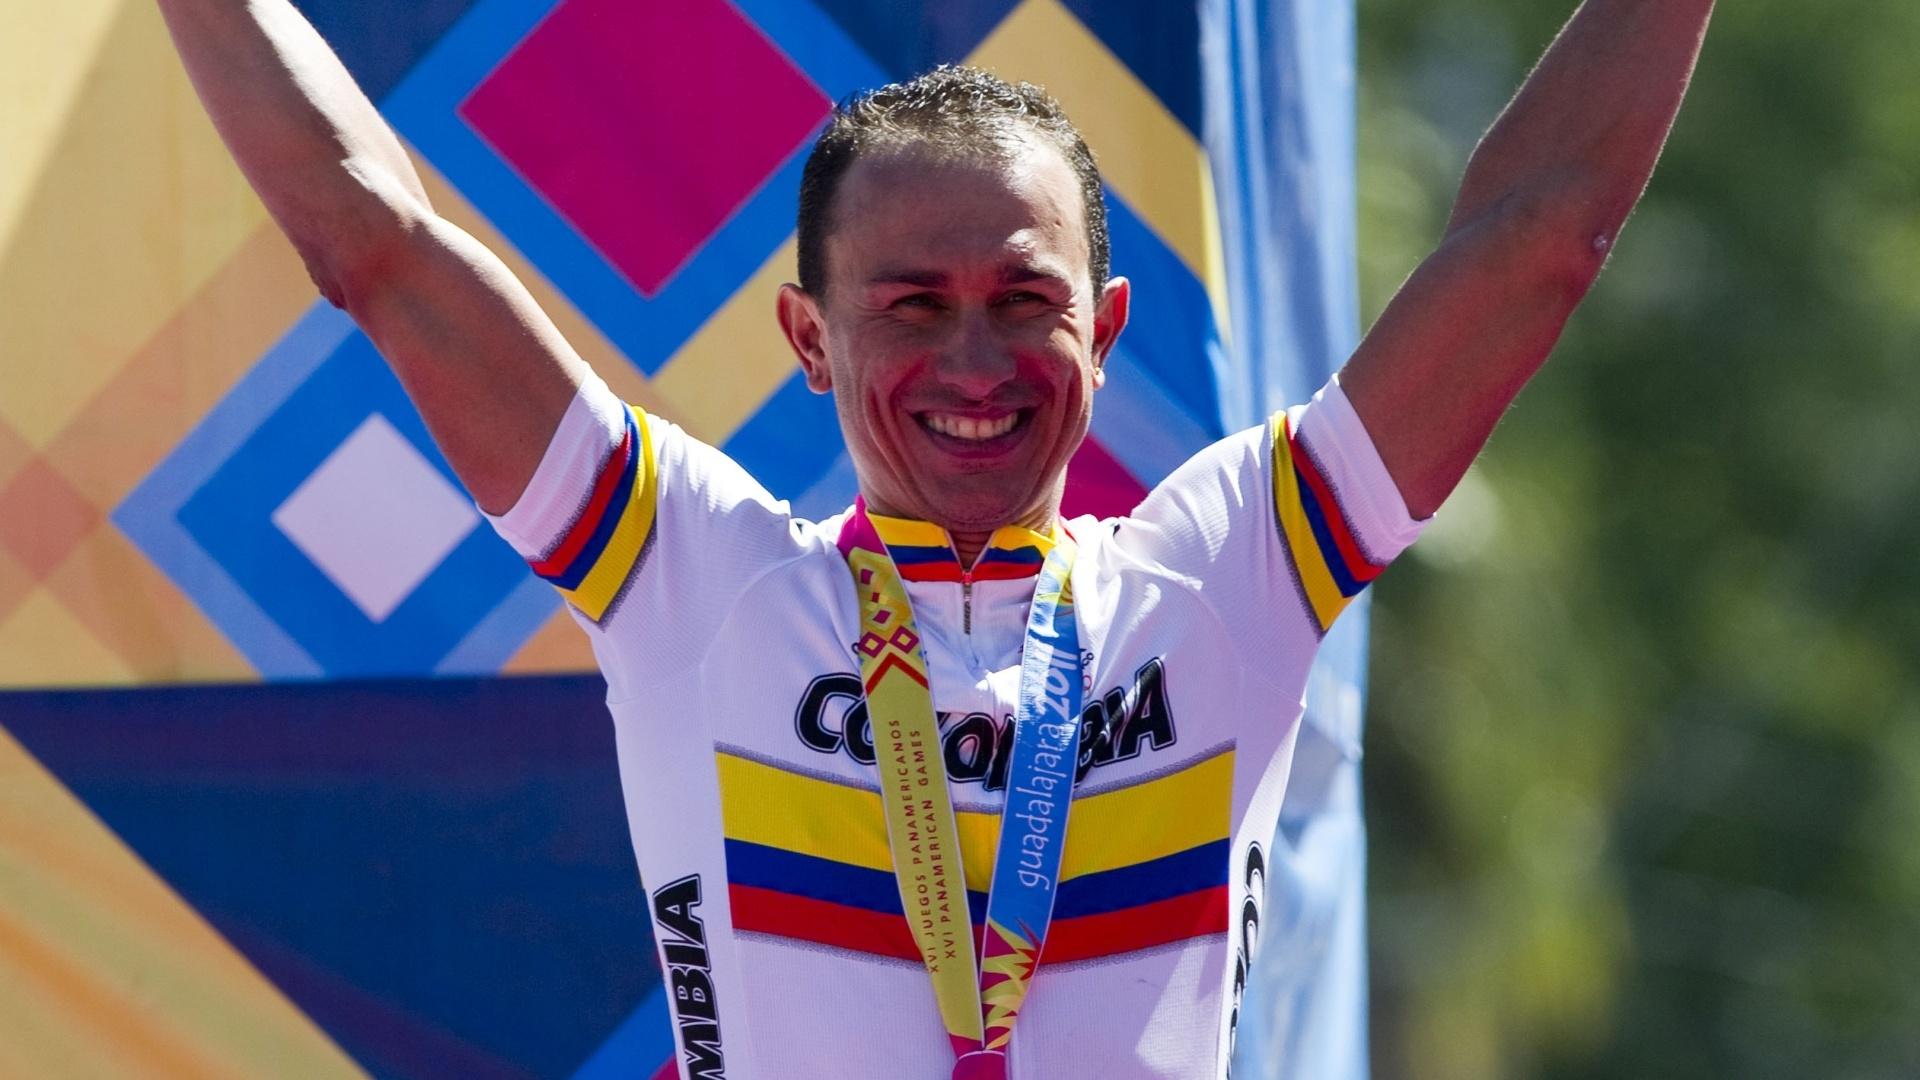 O ciclista colombiano Marlon Perez comemora a medalha de ouro na prova contrarrelogio em Guadalajara